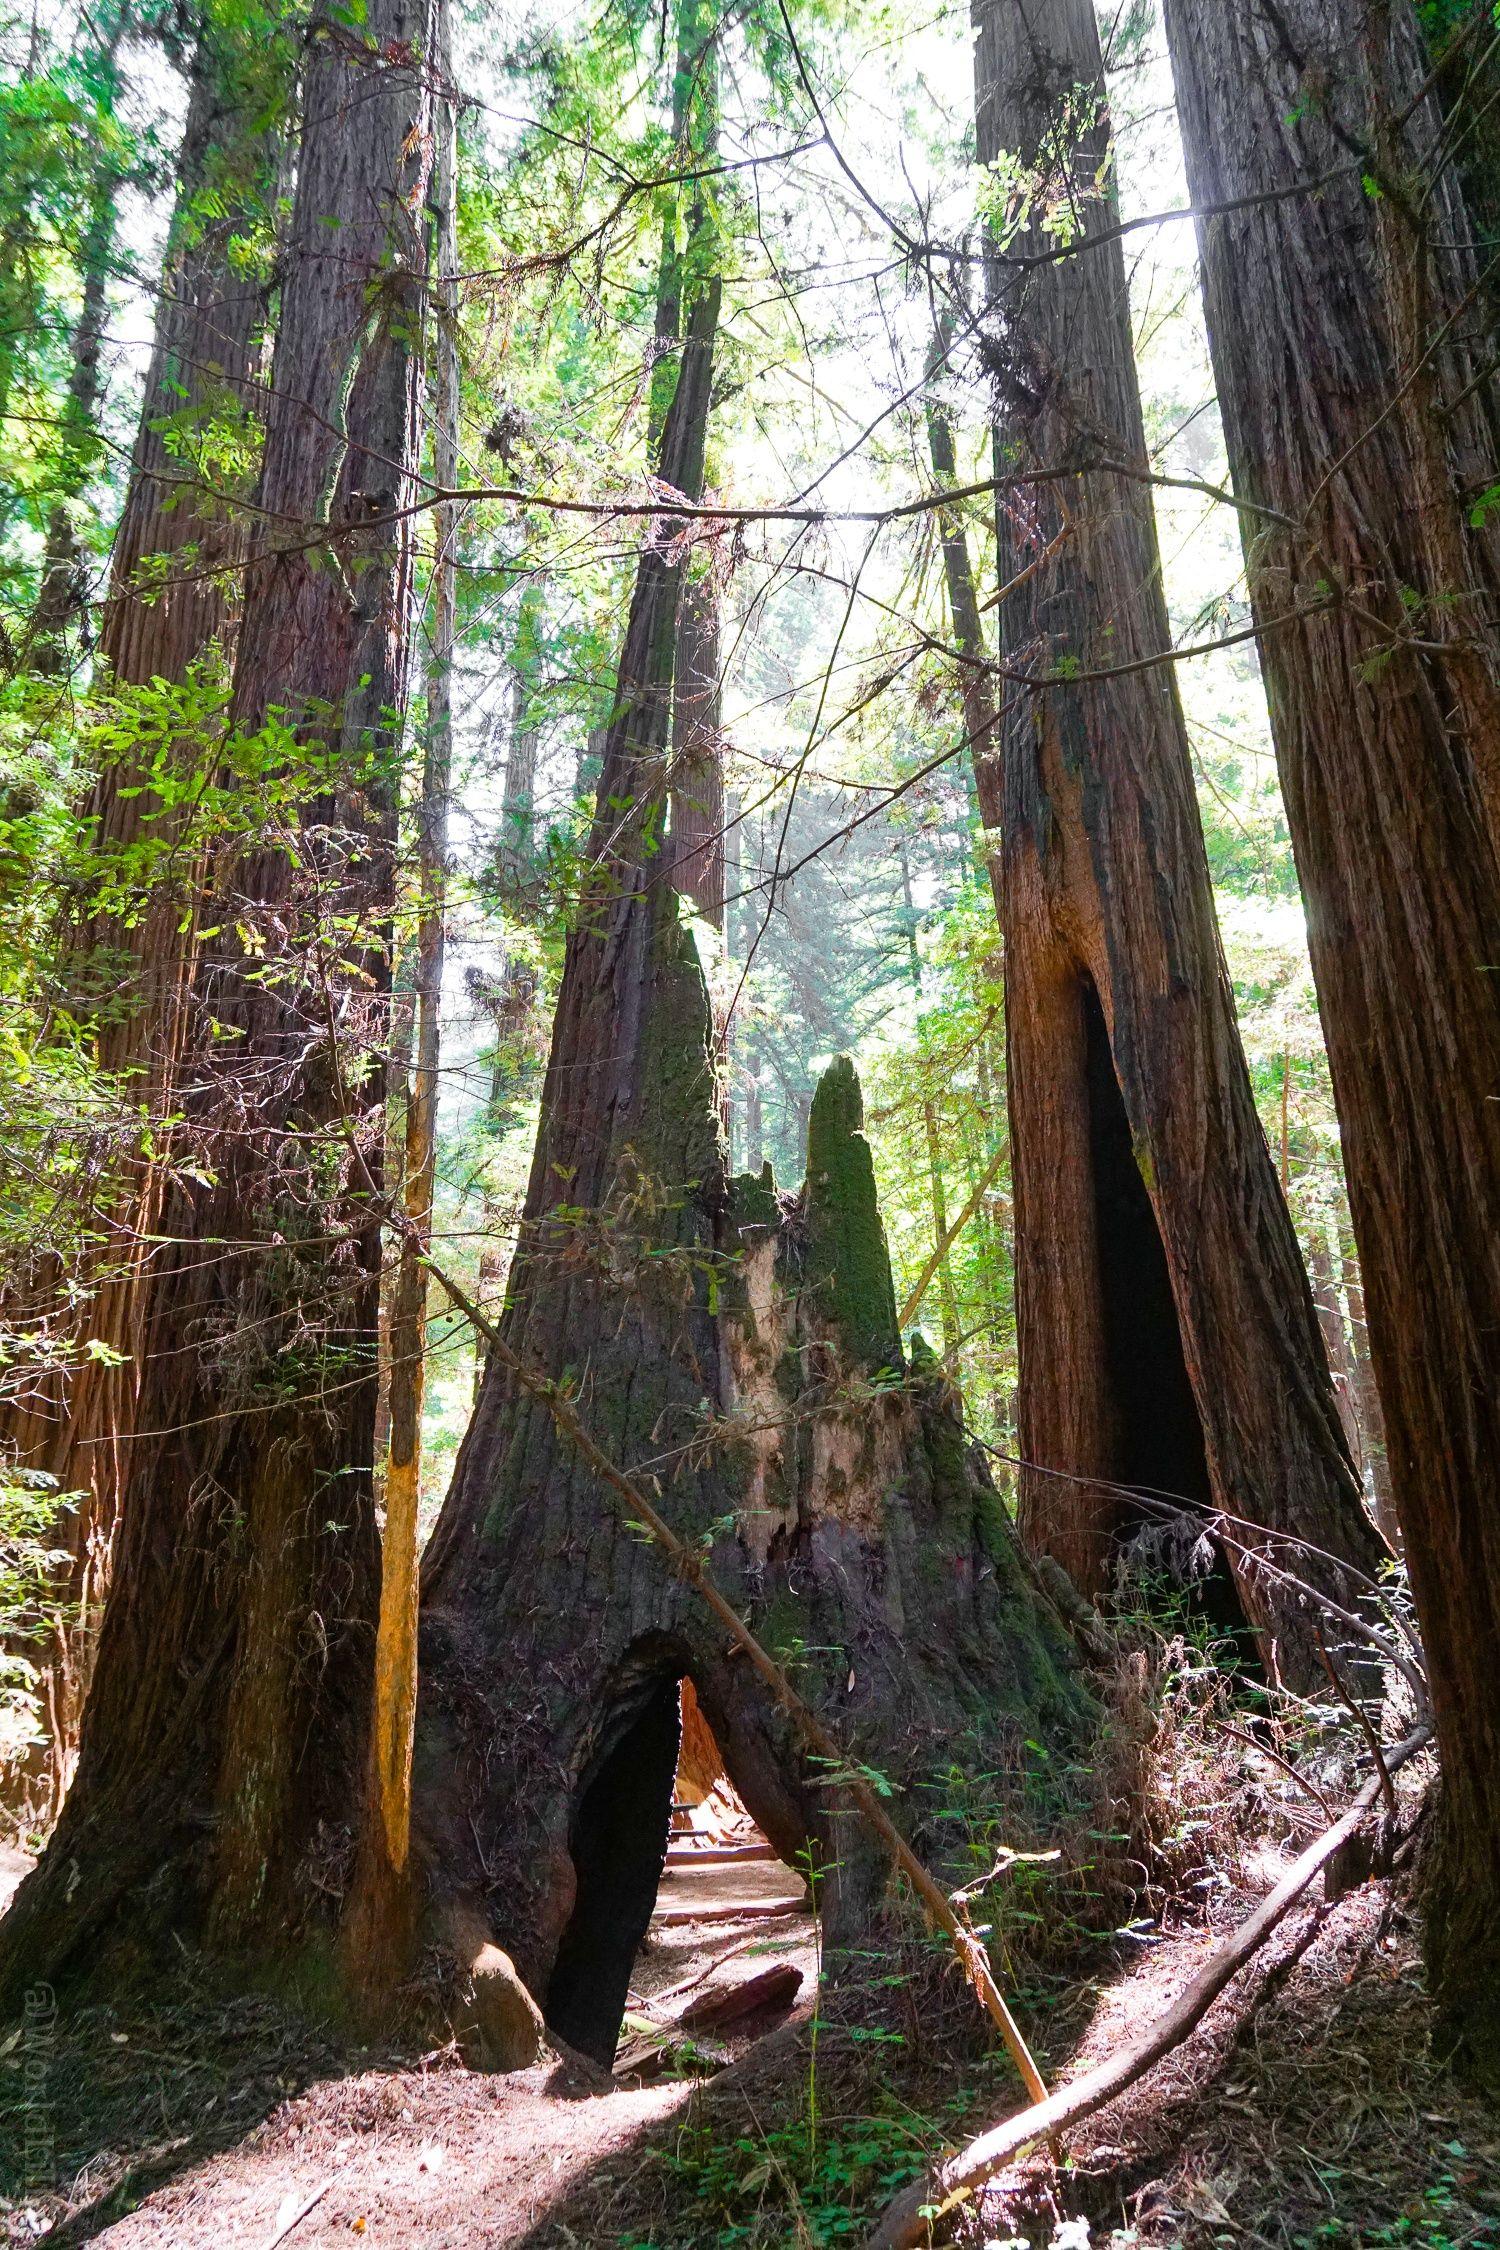 A California Redwoods Hike Near Santa Cruz, Ideal for Kids - Around on